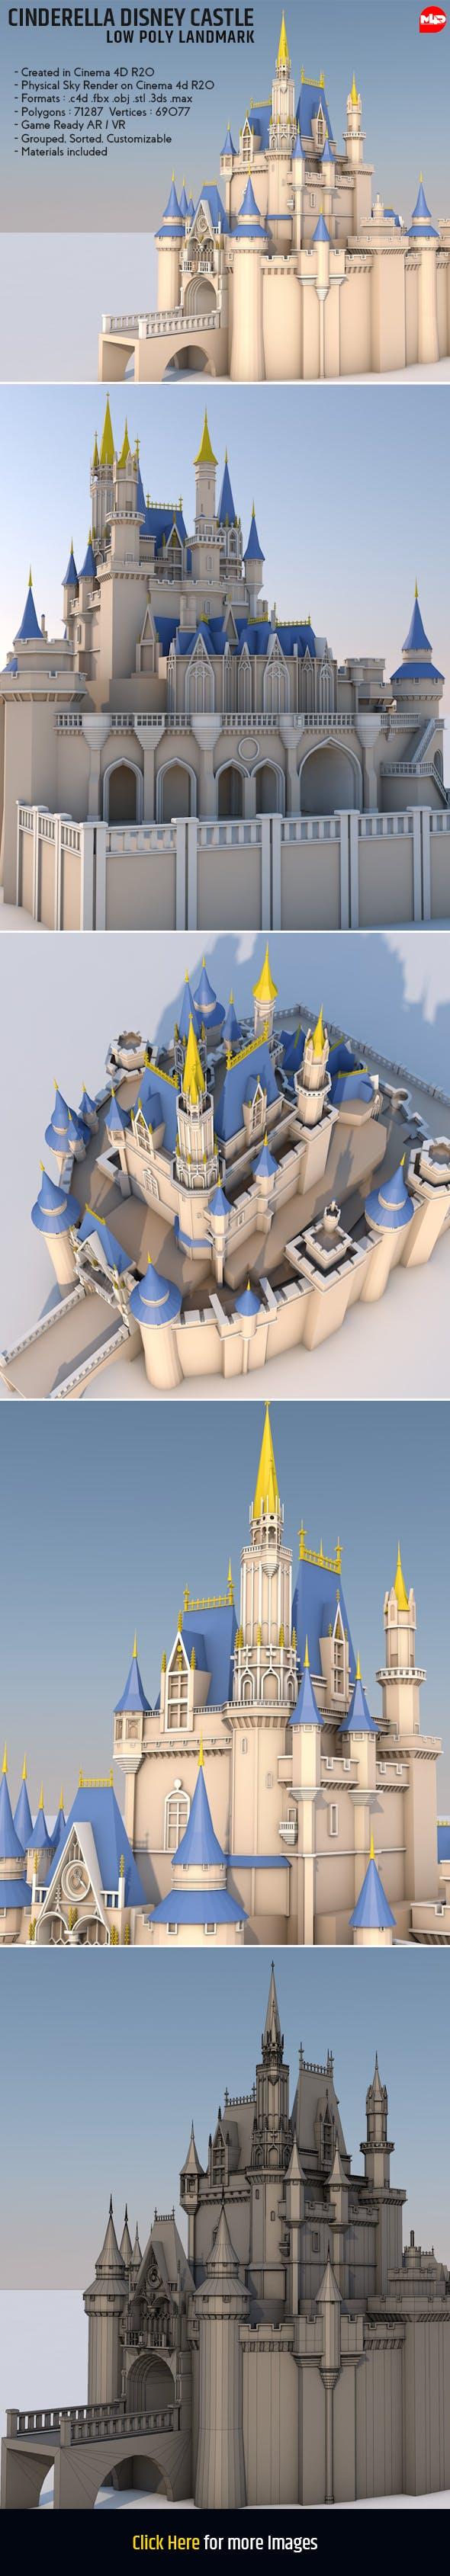 Low Poly Cinderella Disney Castle Landmark - 3DOcean Item for Sale